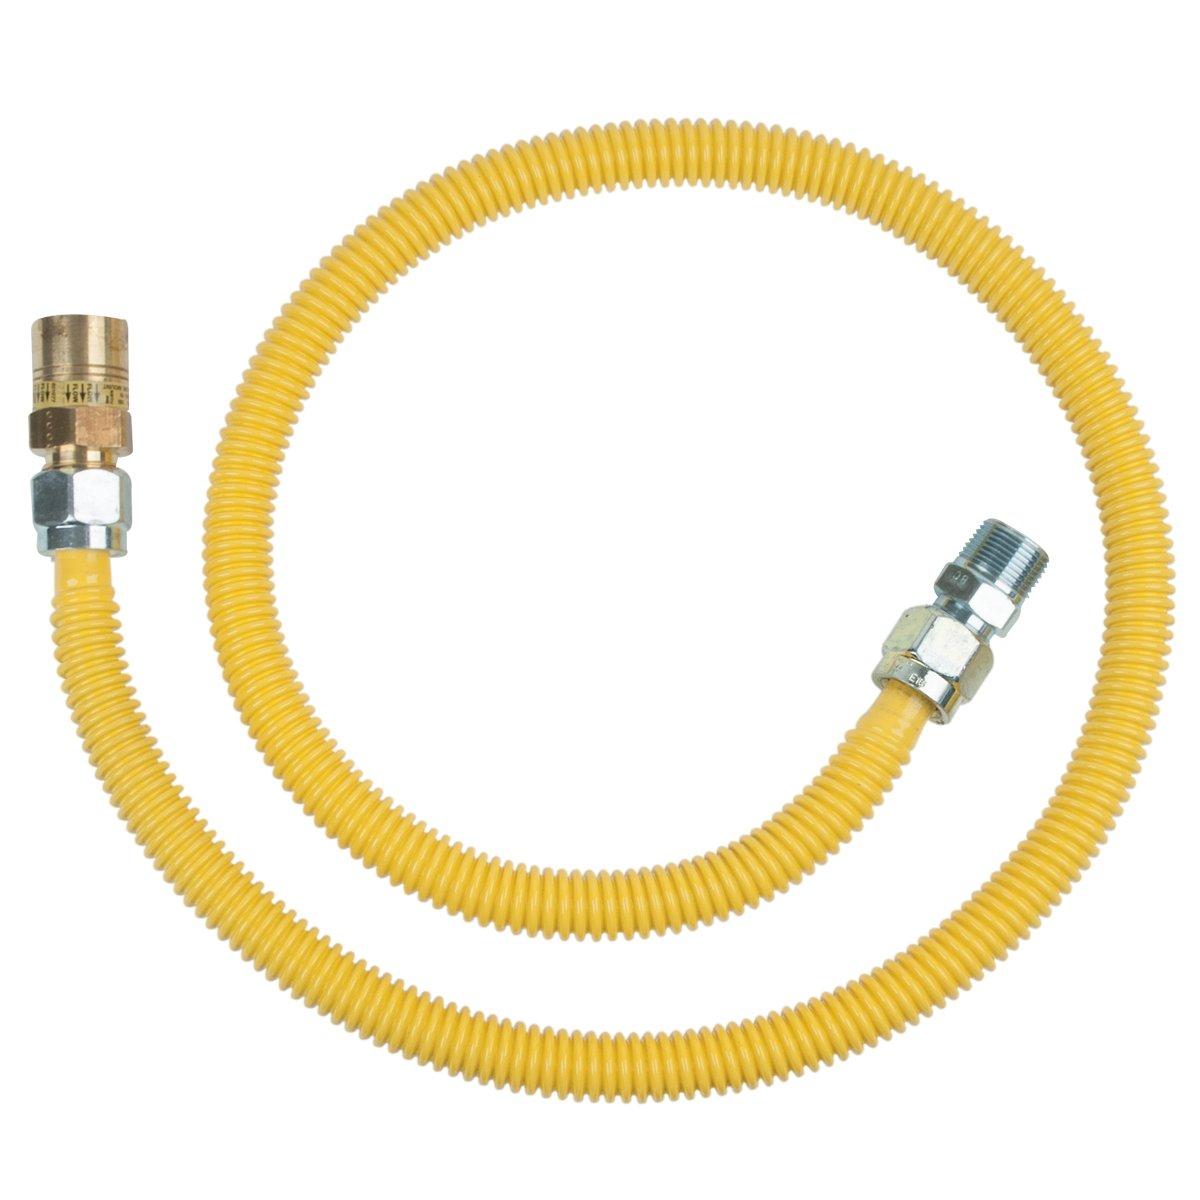 BrassCraft CSSC91R-48 P Safety PLUS Gas 5/8'' OD Connector with 5/8'' Female Flare EFV x 3/4'' MIP x 36''